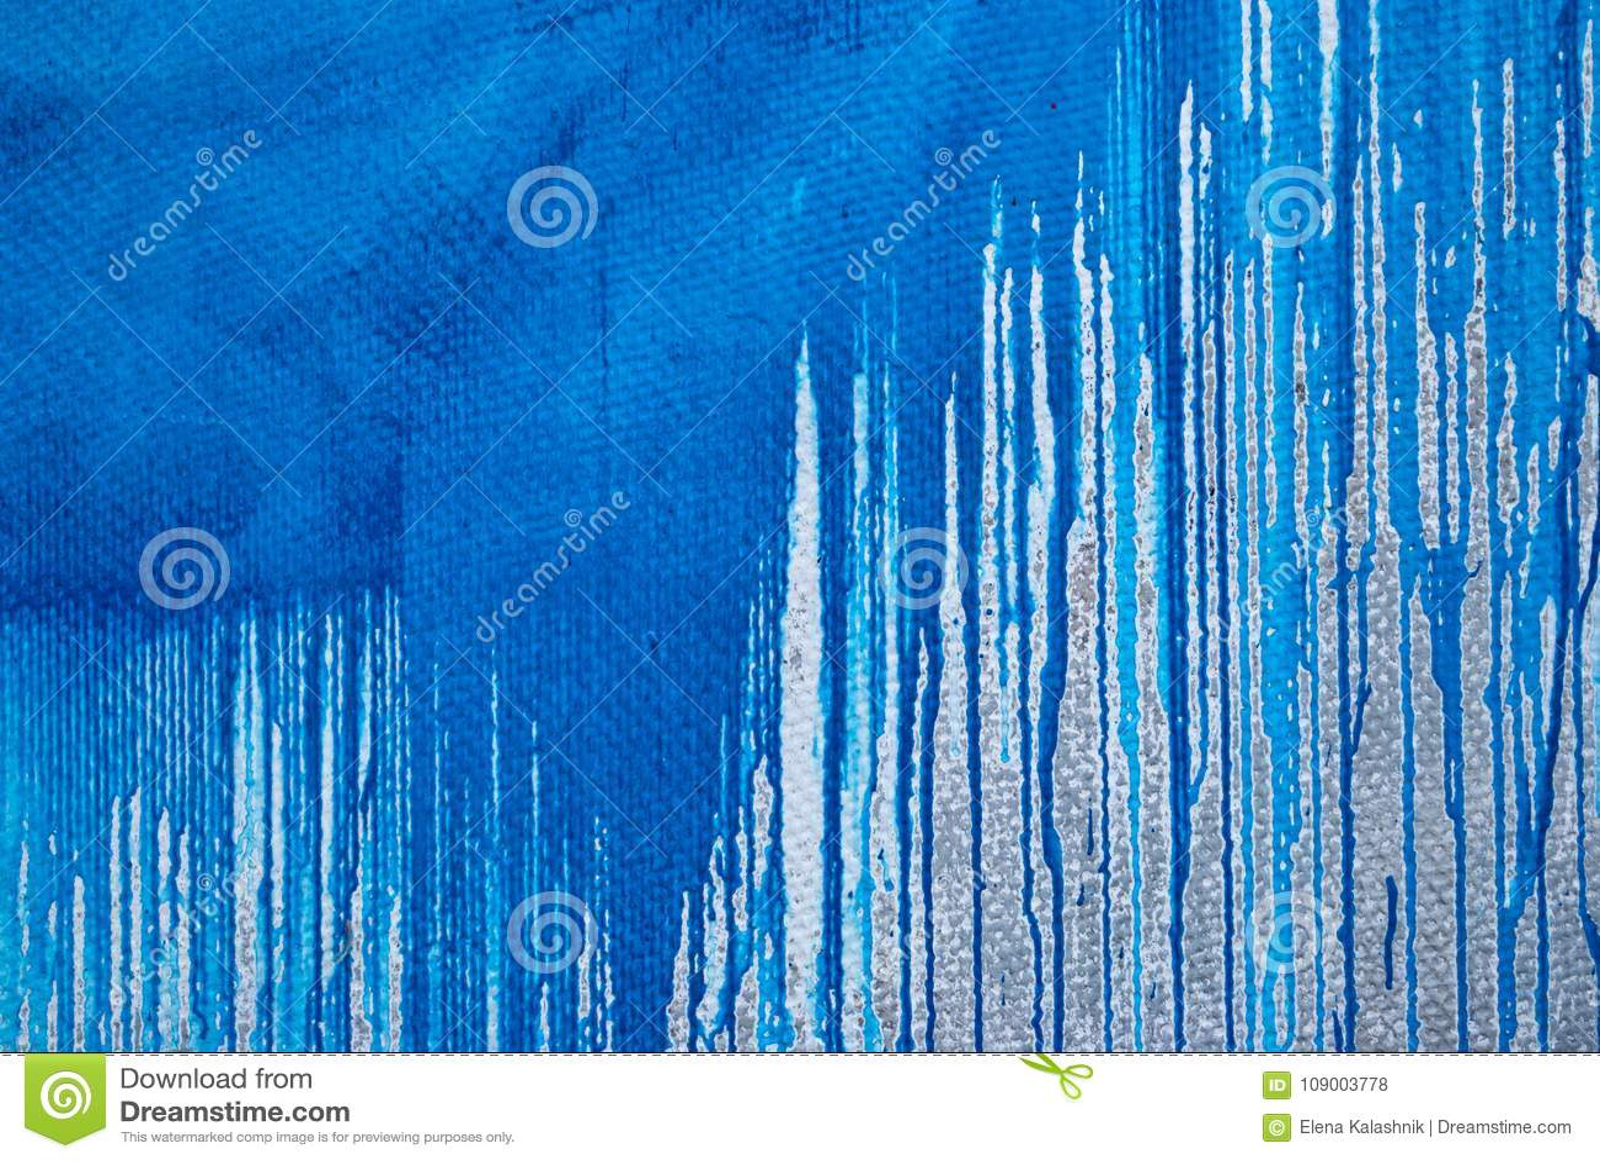 Mur En Béton Taches De Peinture Bleue Graffiti Photo Stock